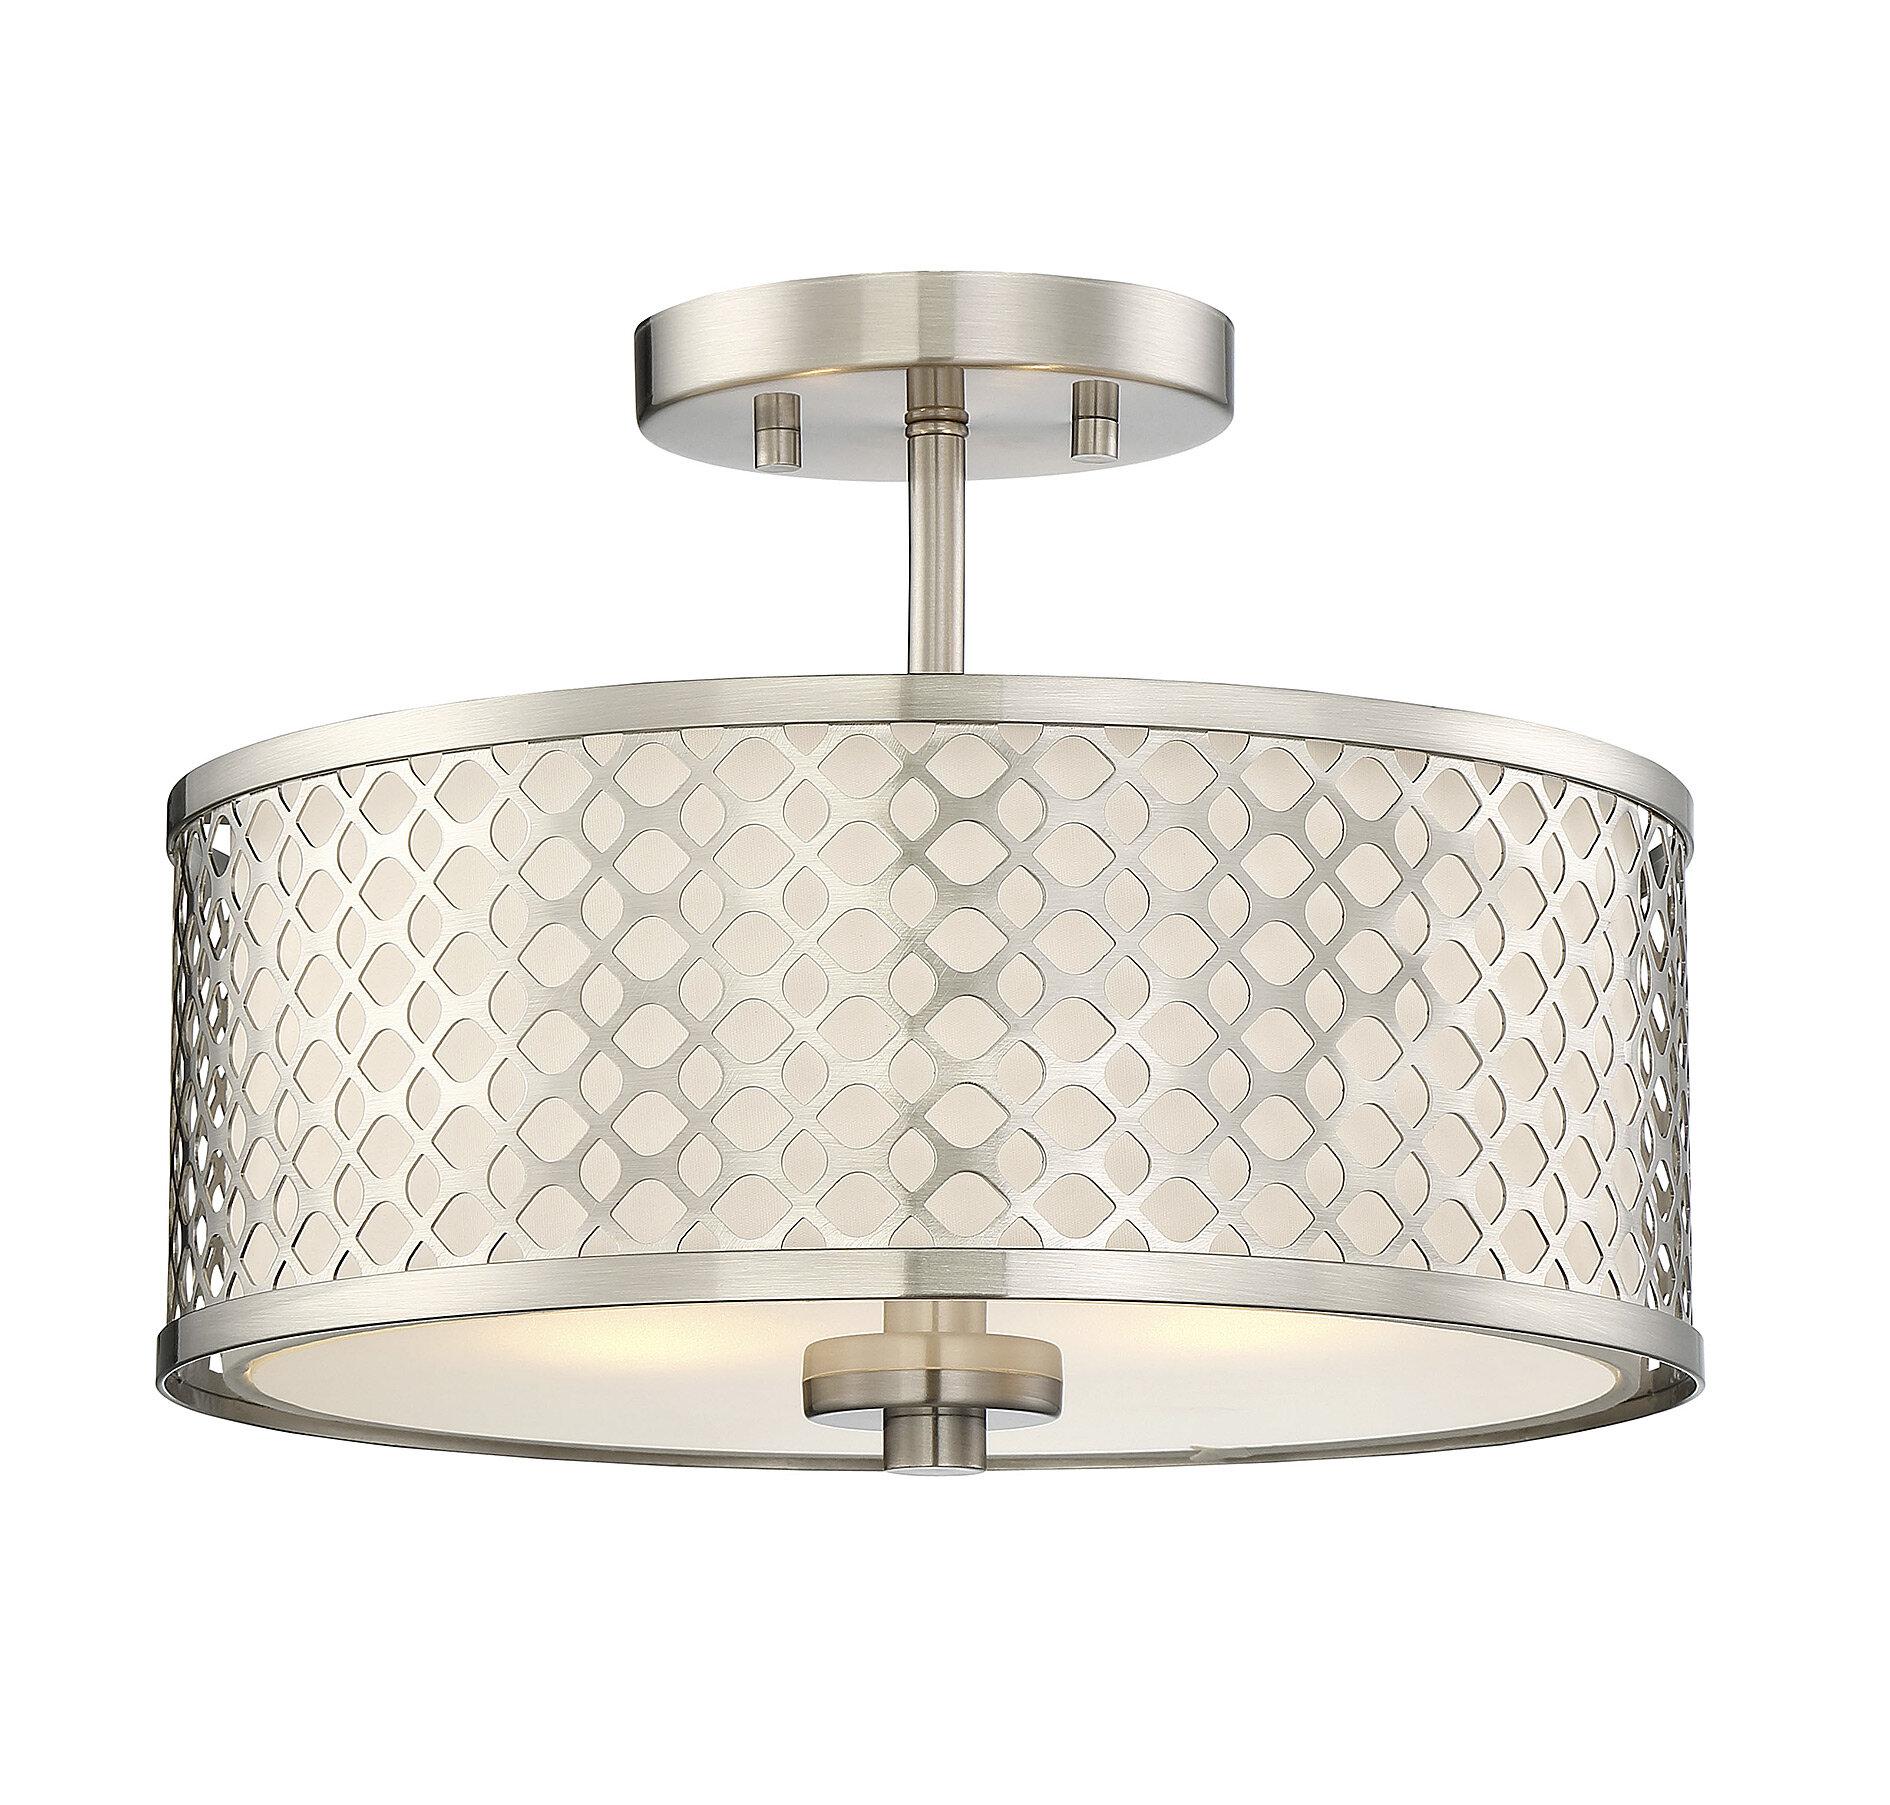 Coolidge 2 light semi flush mount